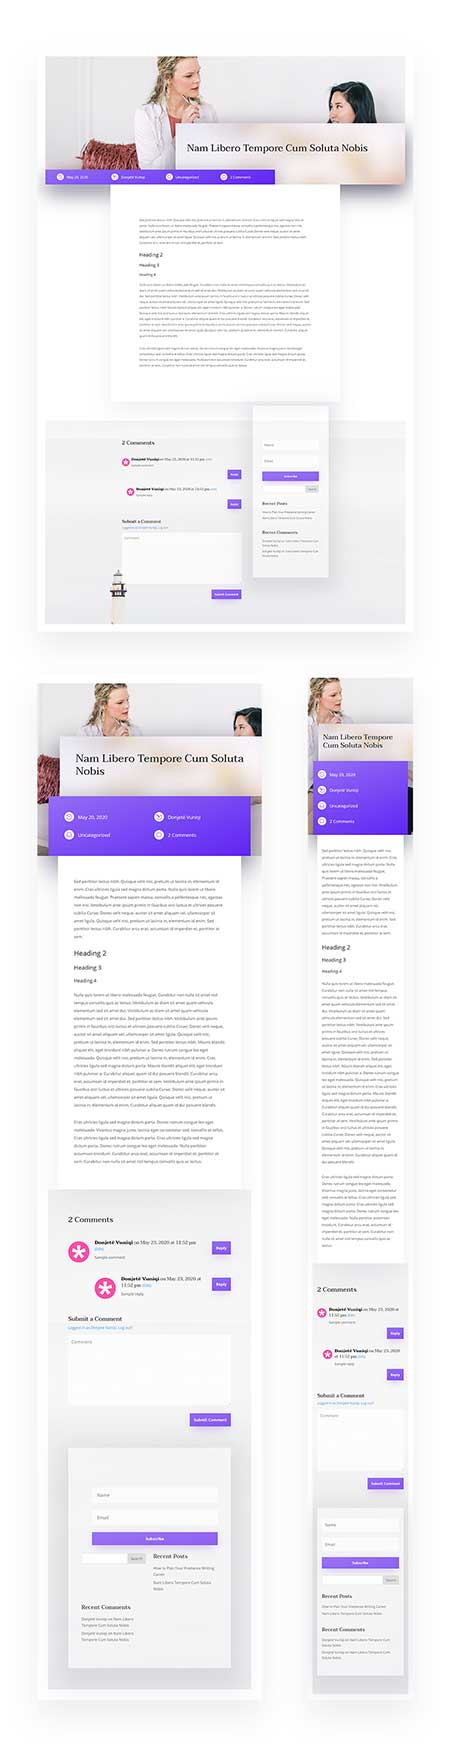 Divi blog post template